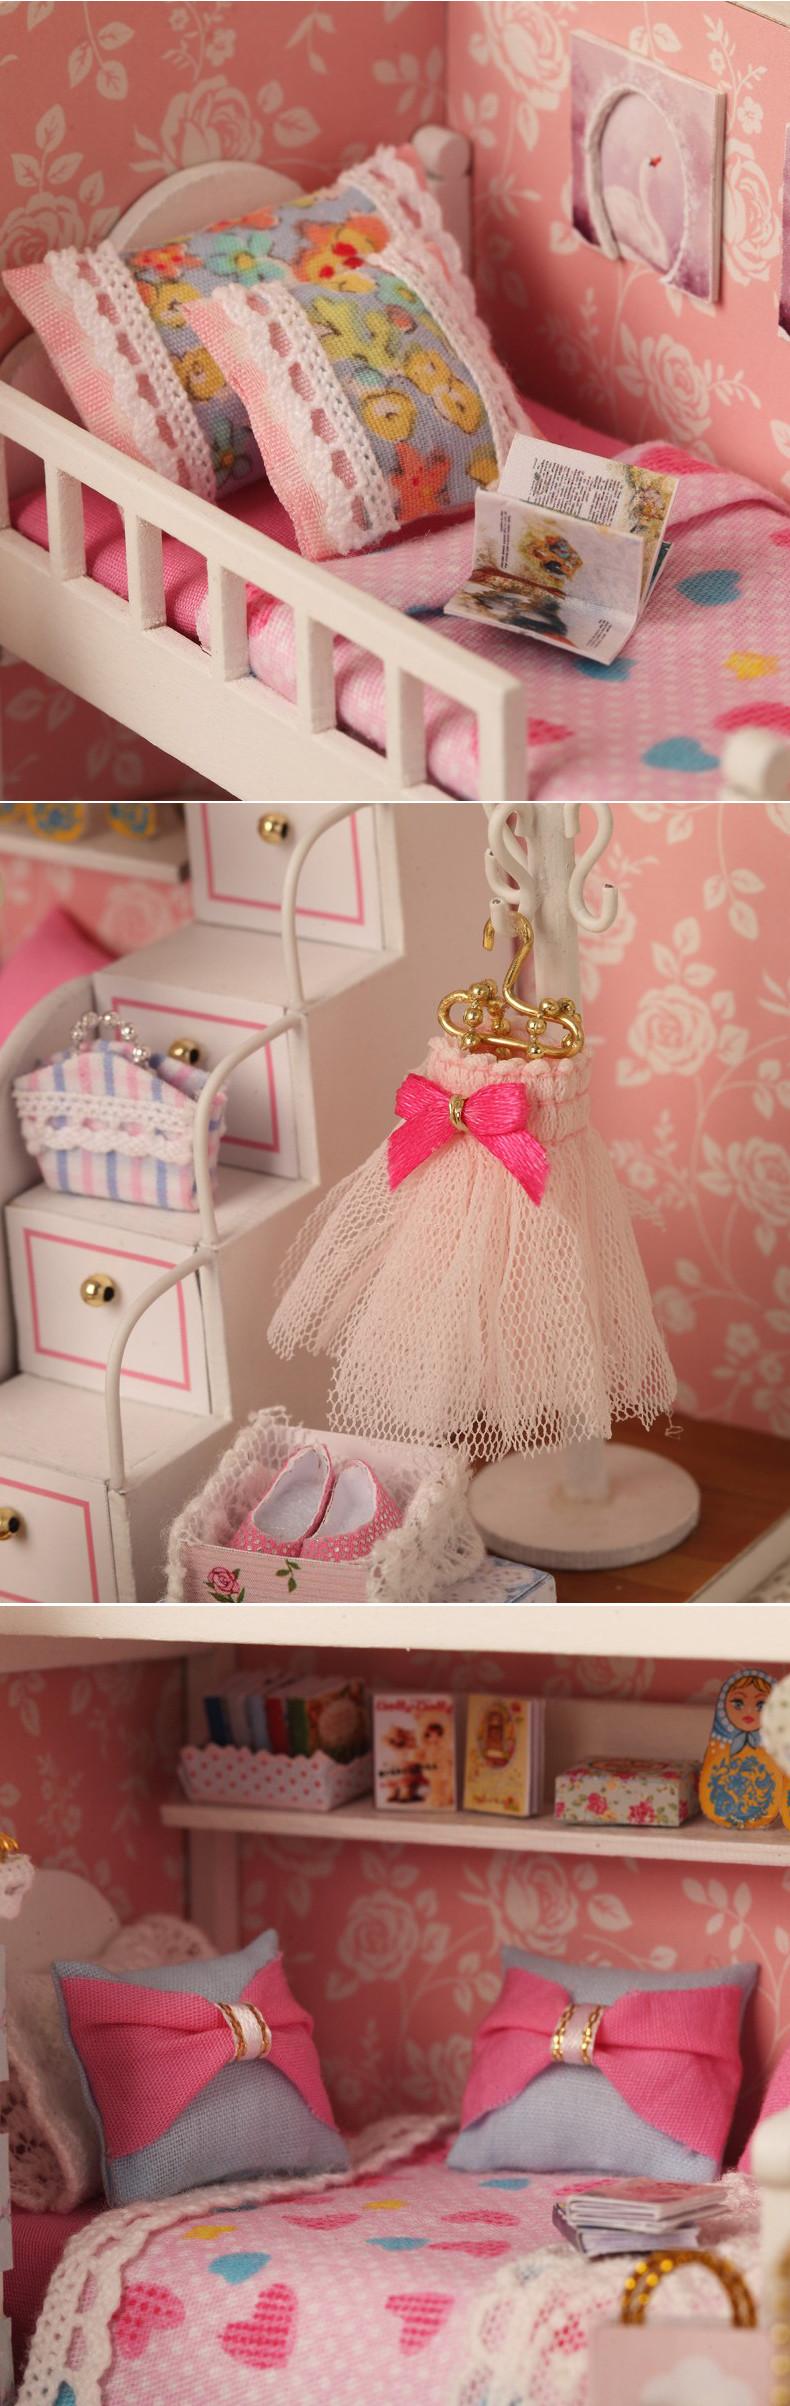 Buy Wooden Miniature Doll House Online In Pakistan